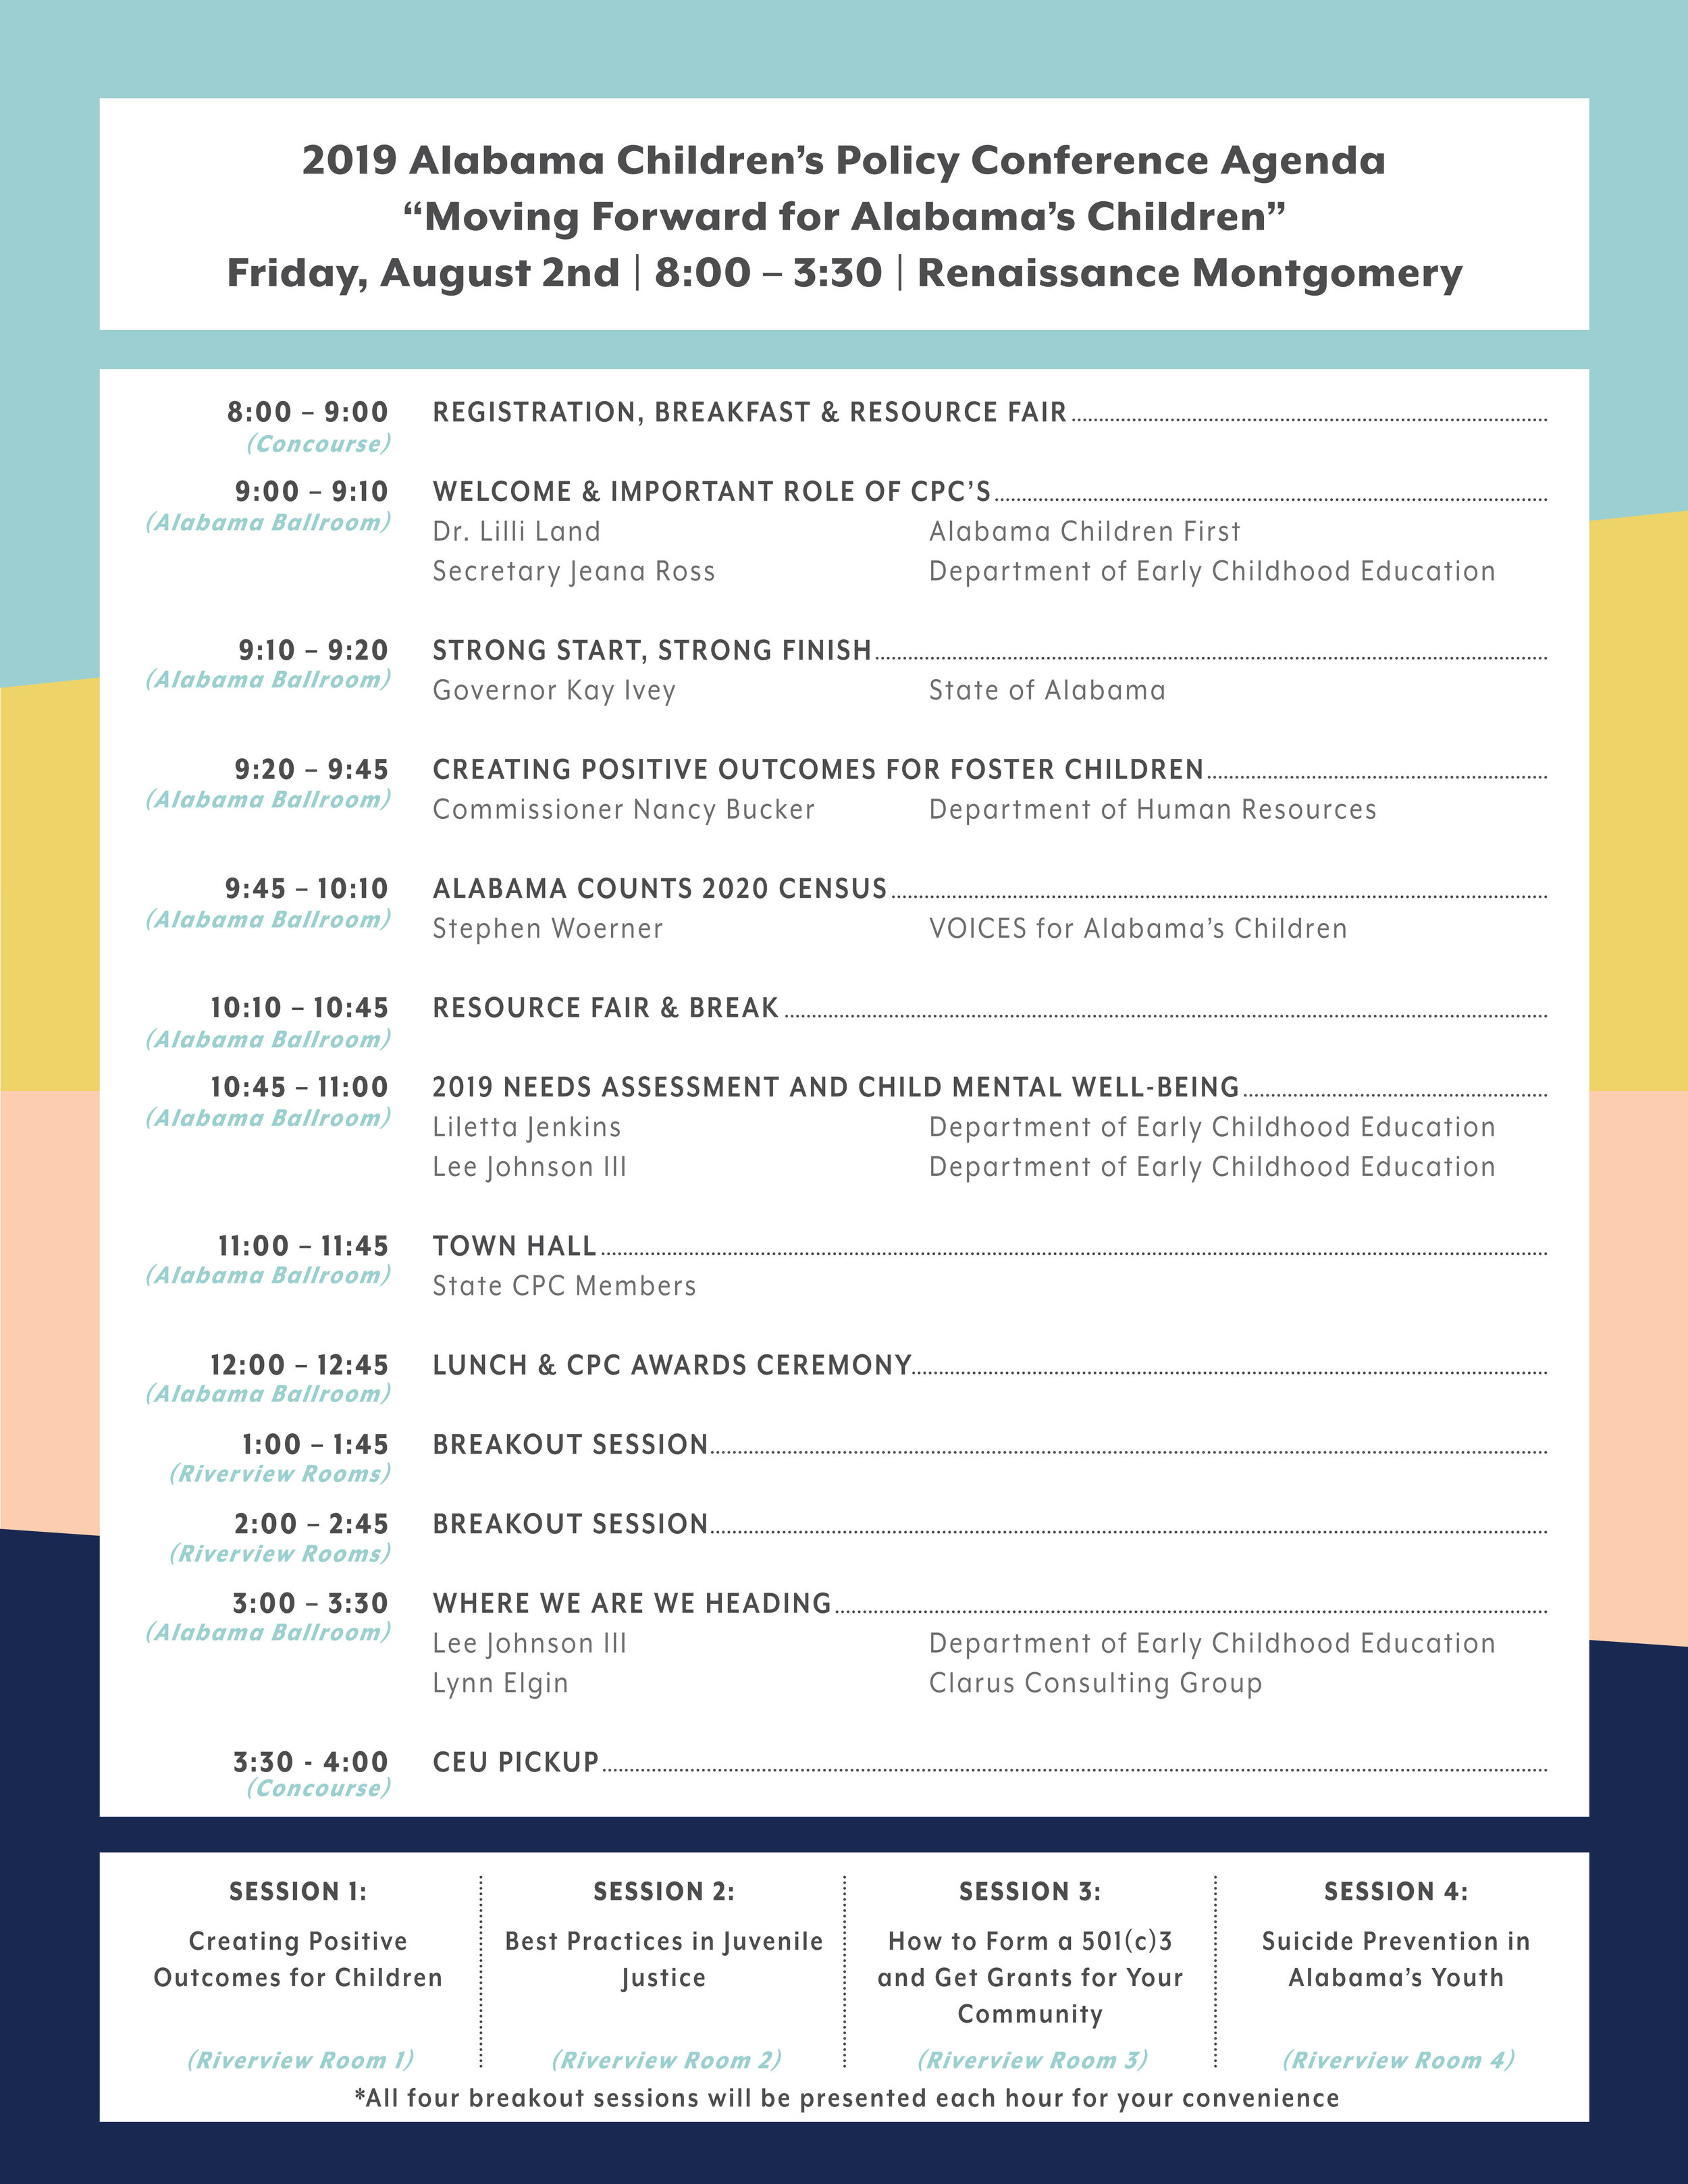 2019 Conference Agenda.jpg